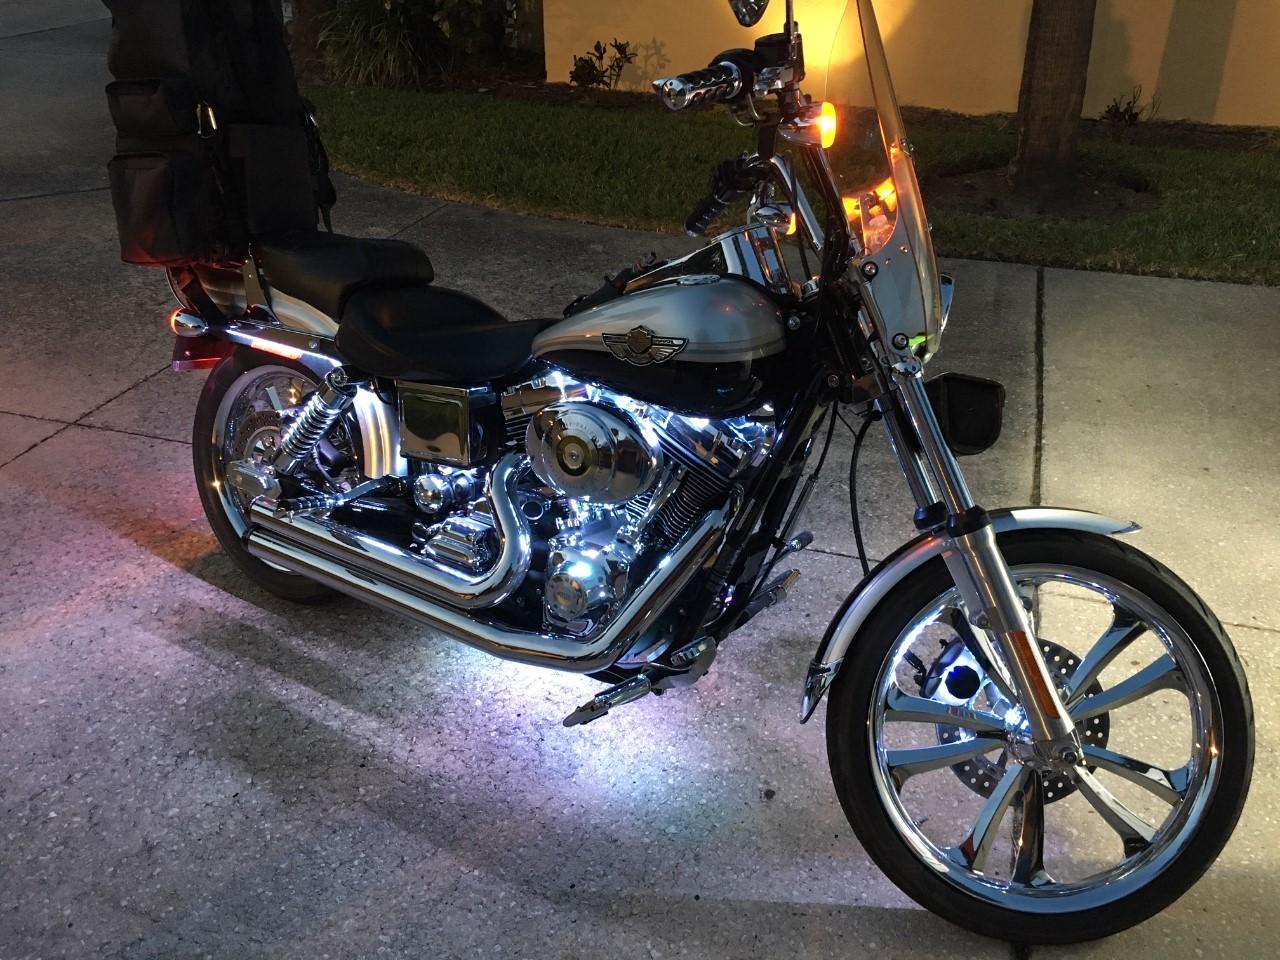 Orlando 599 Used Mini Motorcycles For Sale Snowmobile Trader Handle Hand Grip Handgrip Ninja Rr R Original